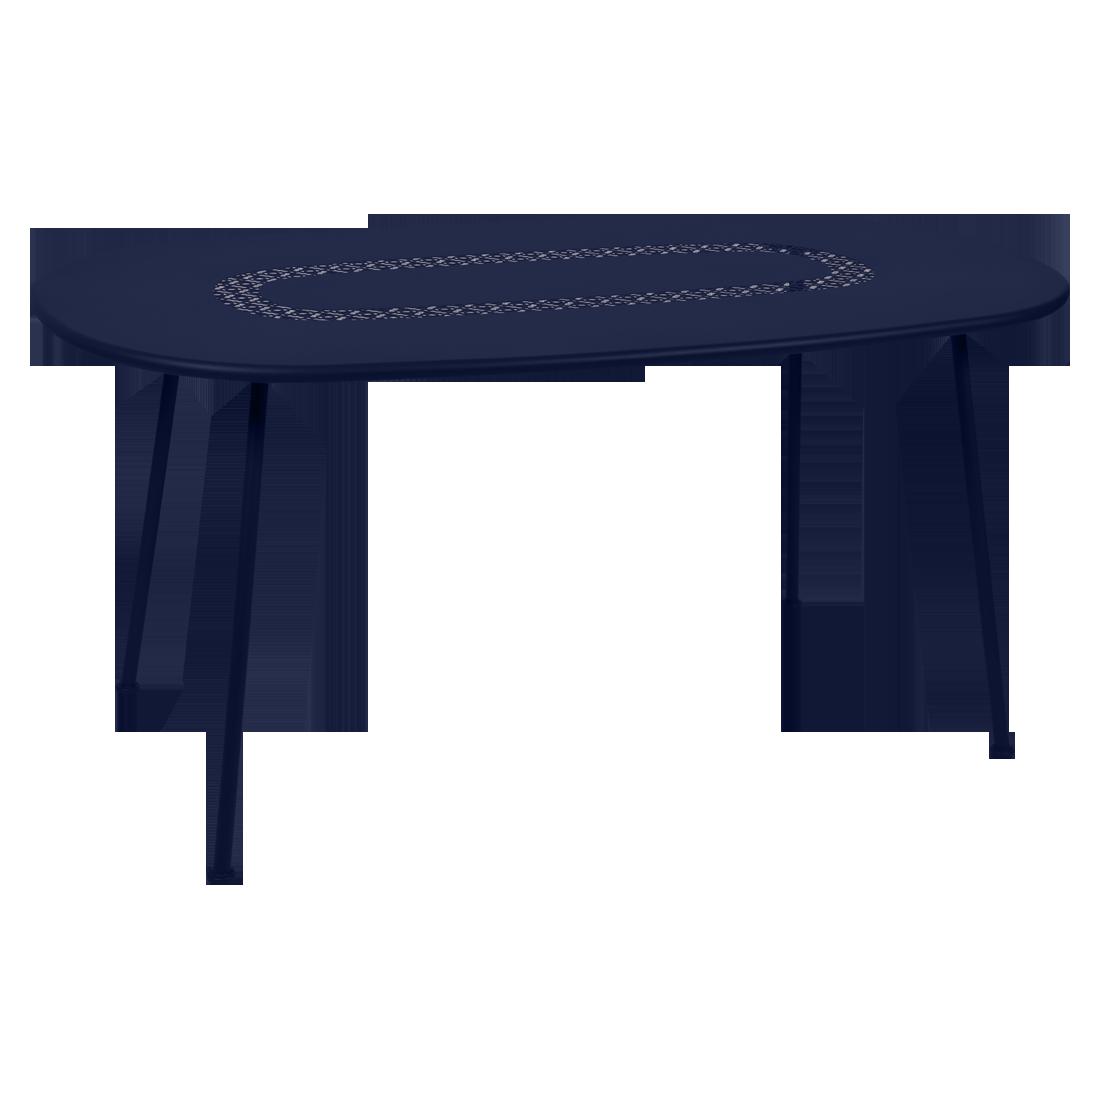 table de jardin, table lorette fermob, table metal, table bleu, table ovale